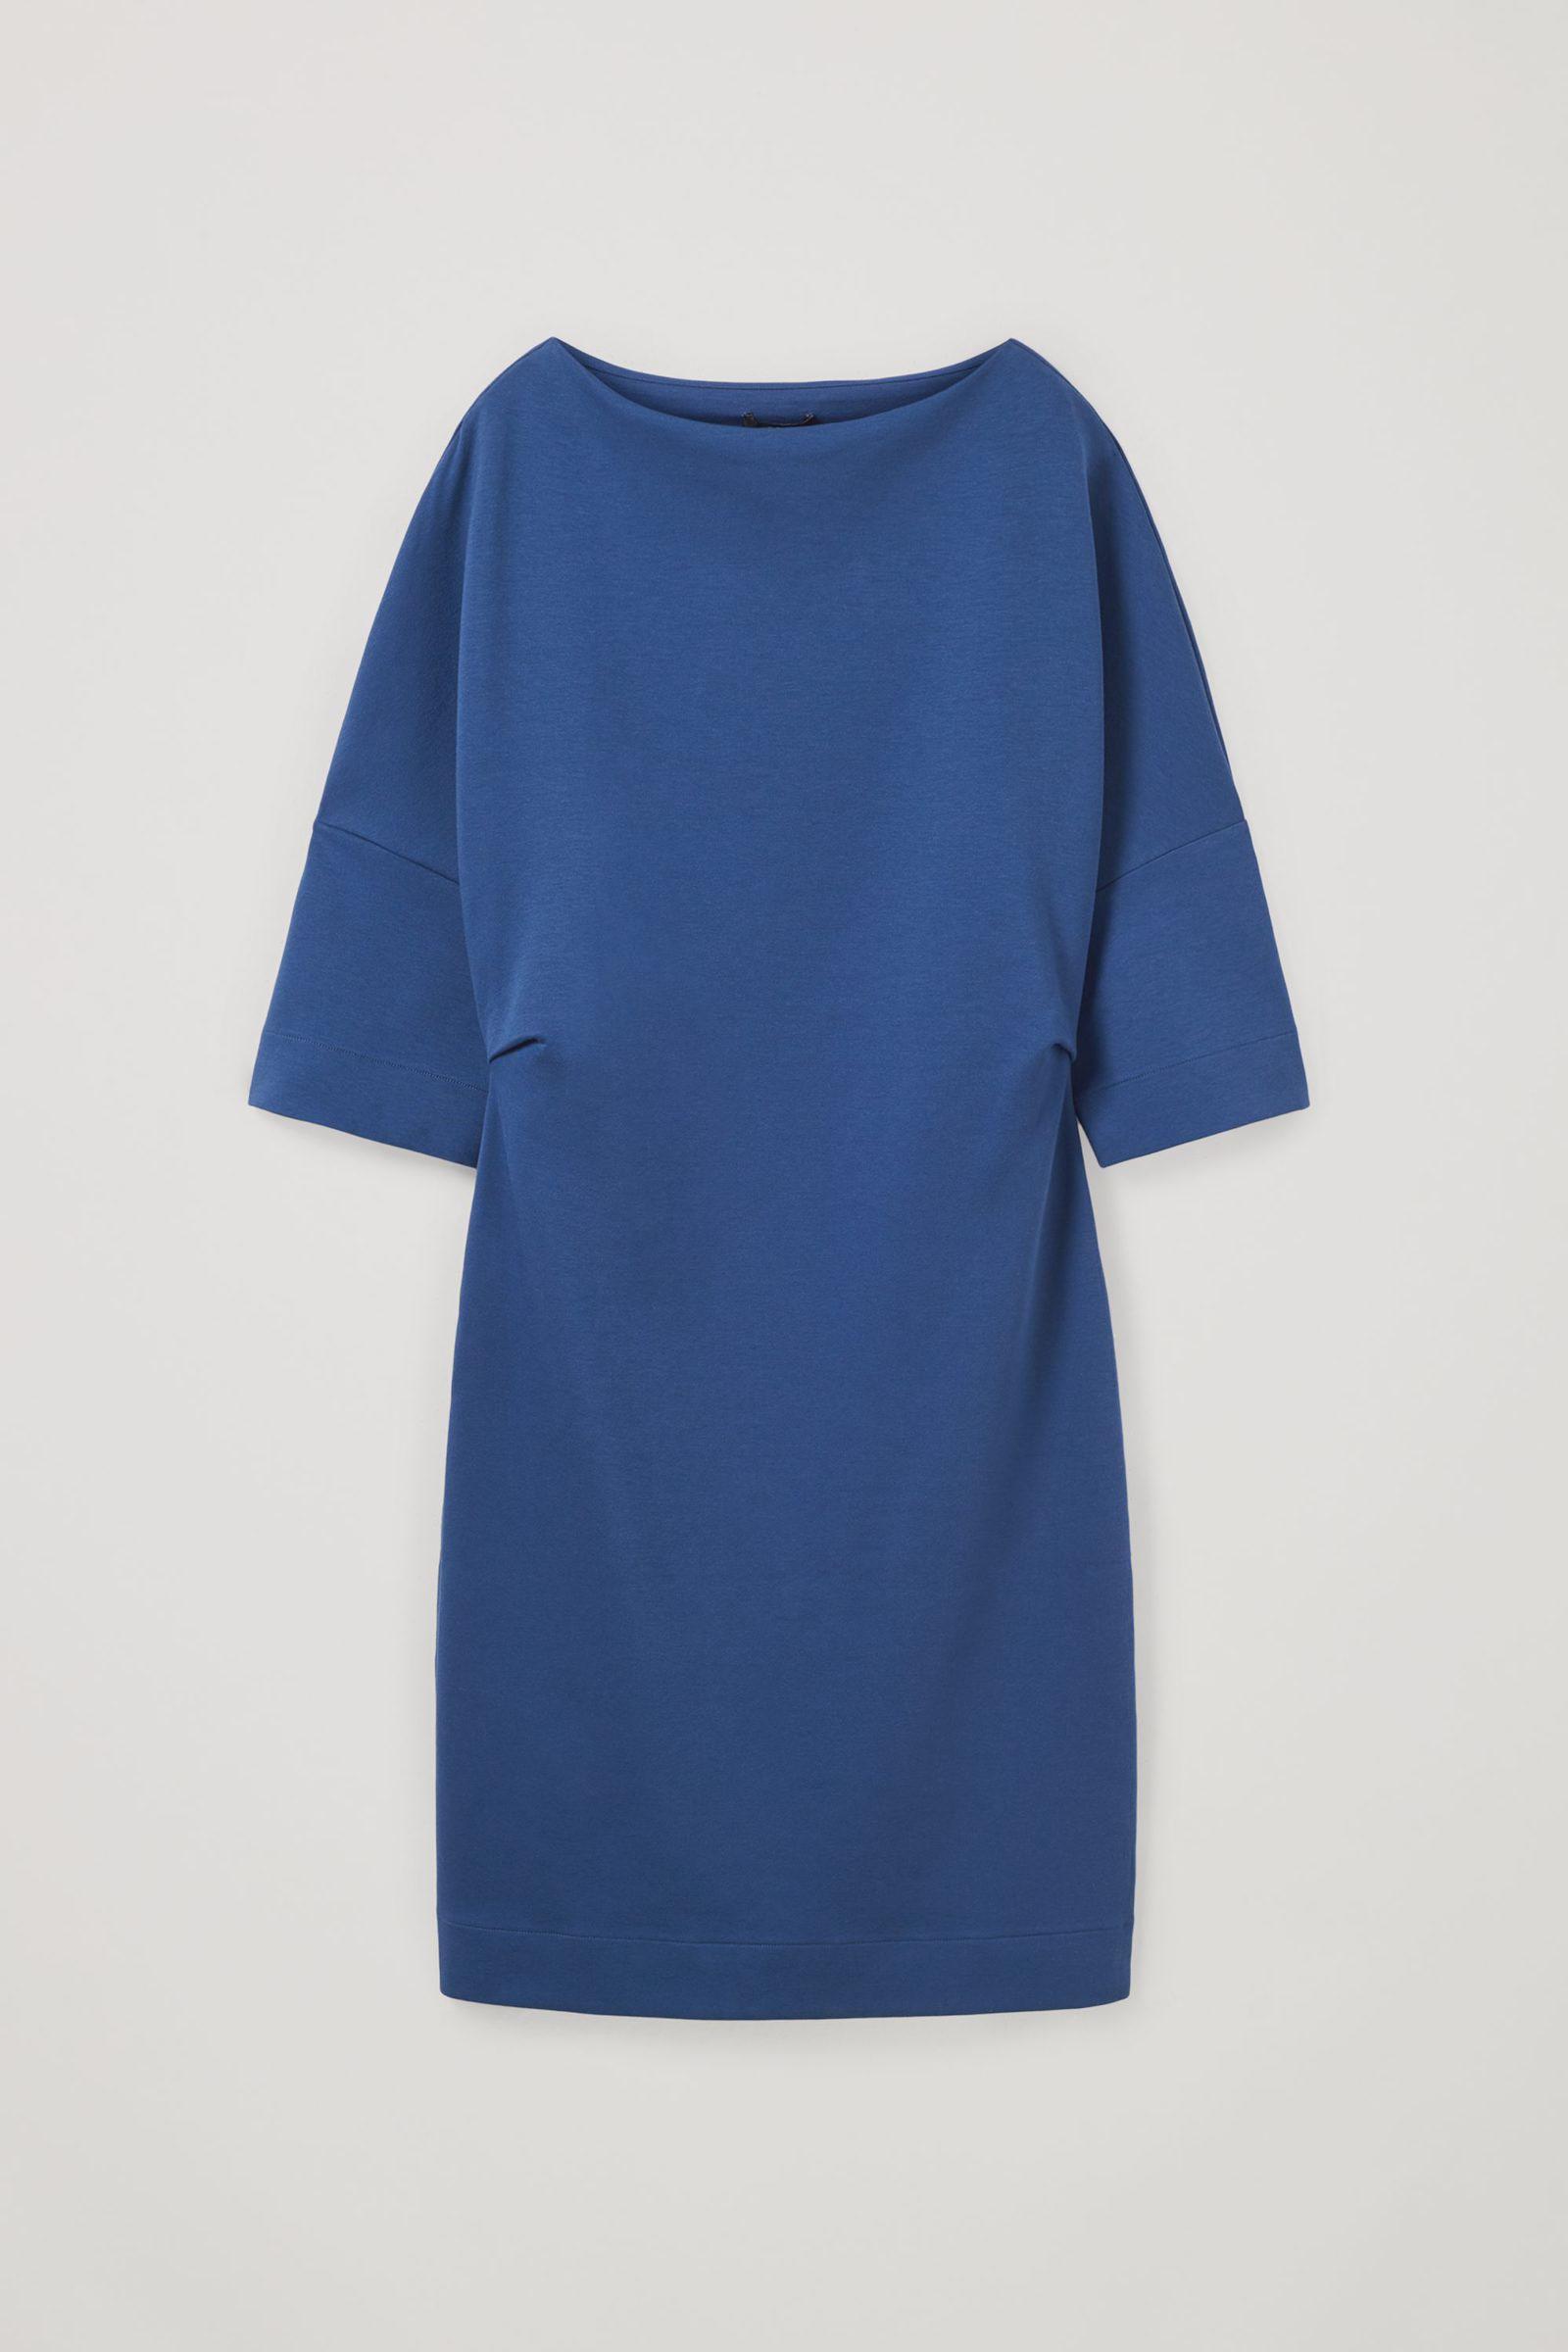 COS 코튼 믹스 티셔츠 드레스의 블루컬러 Product입니다.